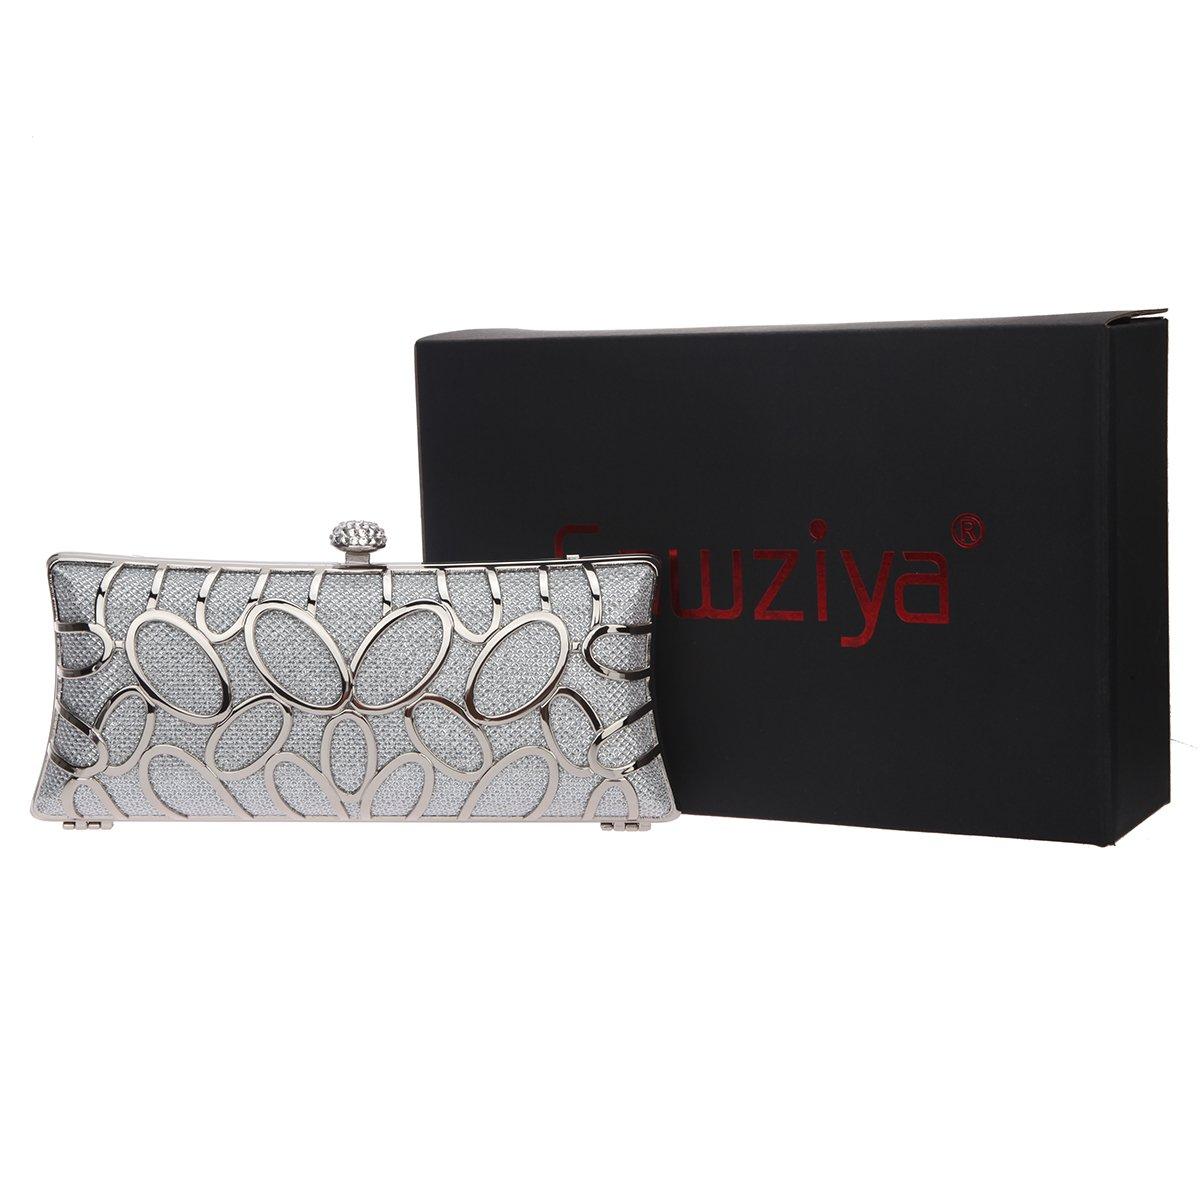 Fawziya Initials Evening Bags And Clutches Glitter Metal Hard Clutch Purses For Women CAE1693Grey